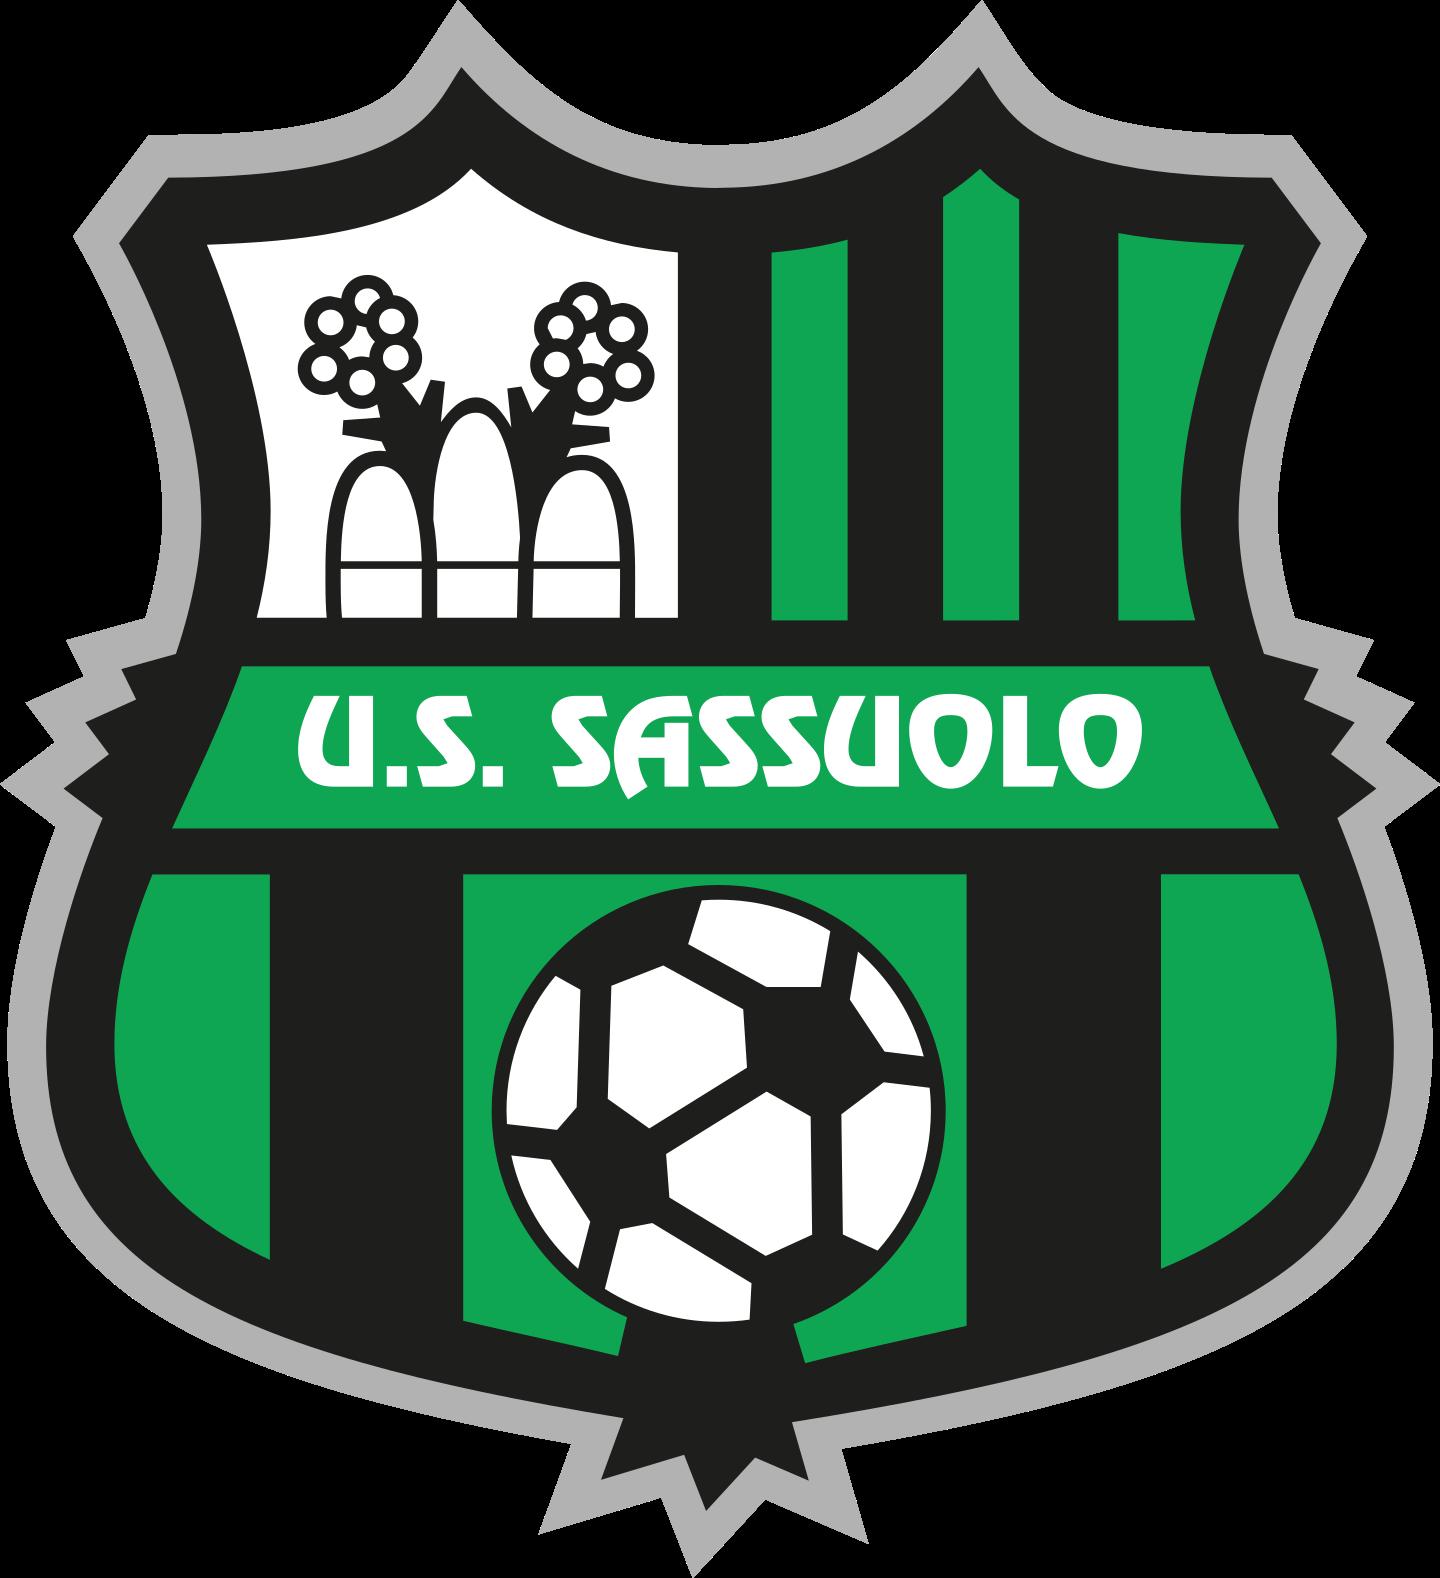 sassuolo calcio logo 2 - Sassuolo Calcio Logo